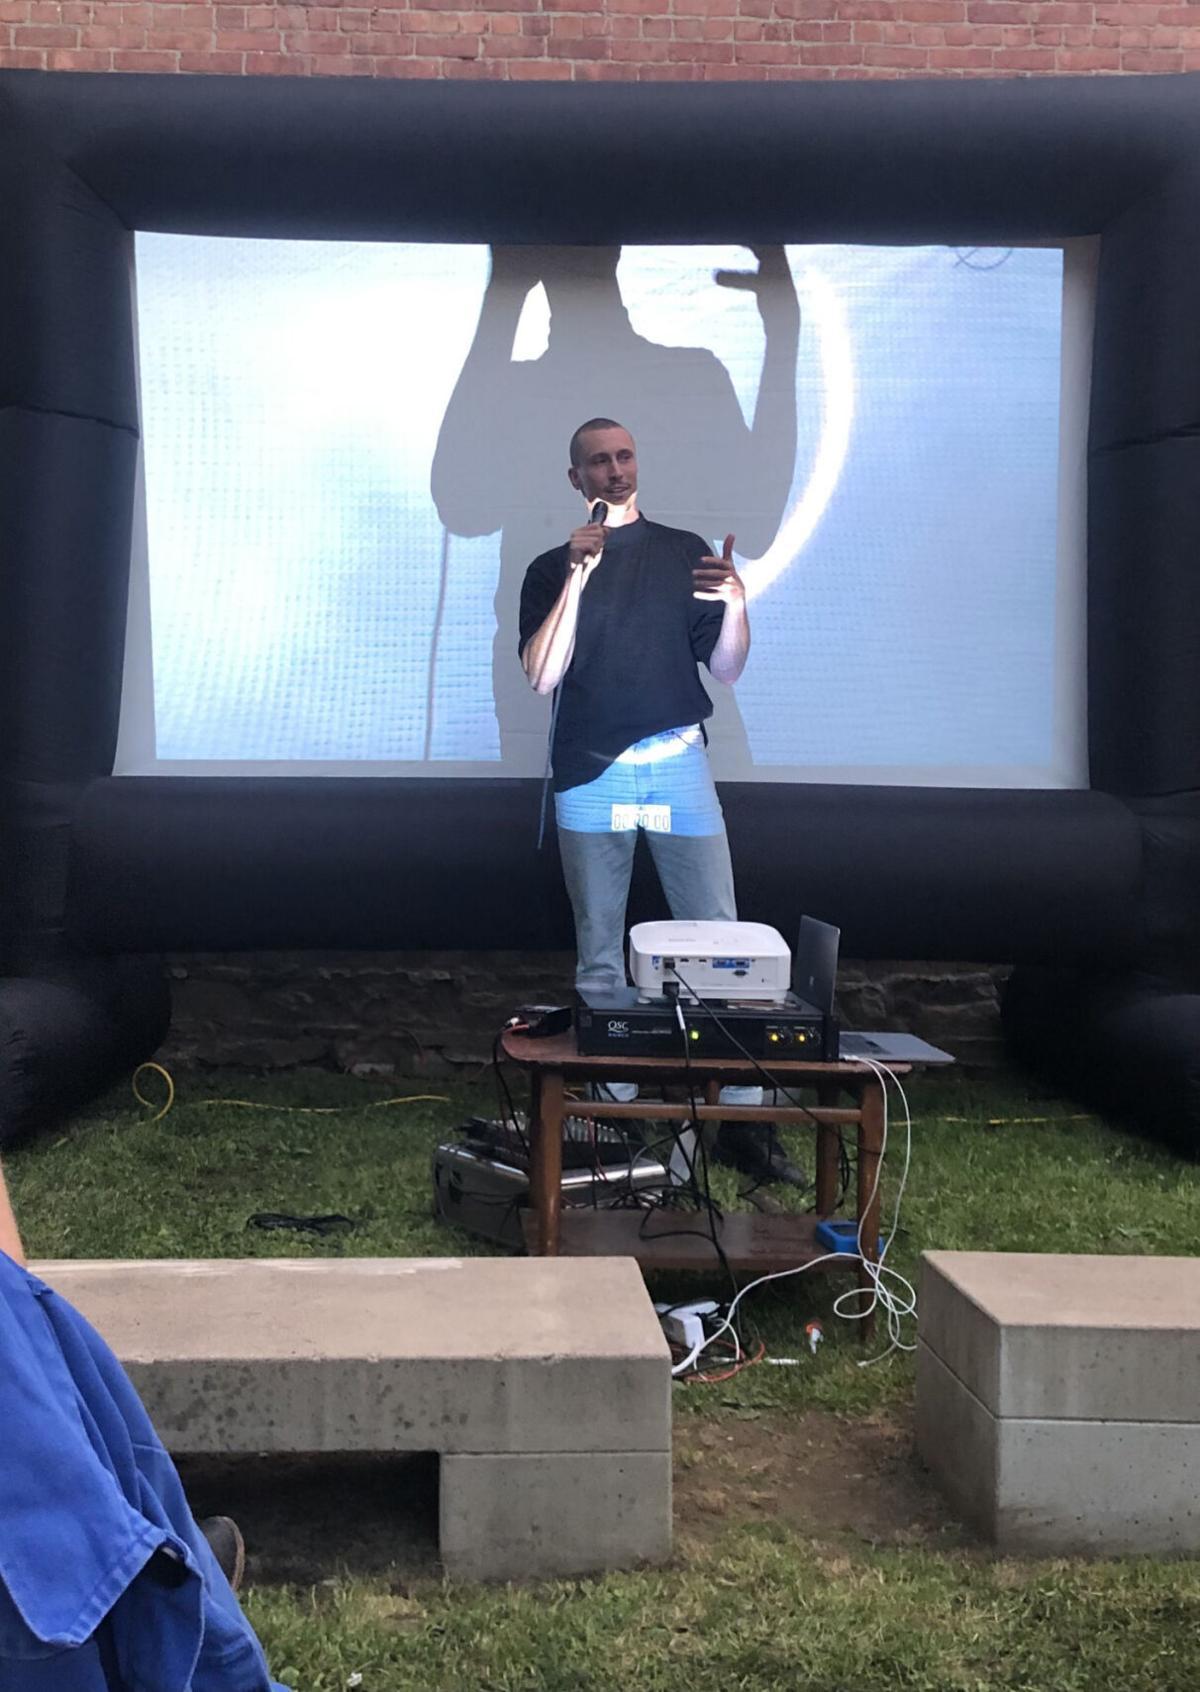 Hudson filmmaker questions body camera policies